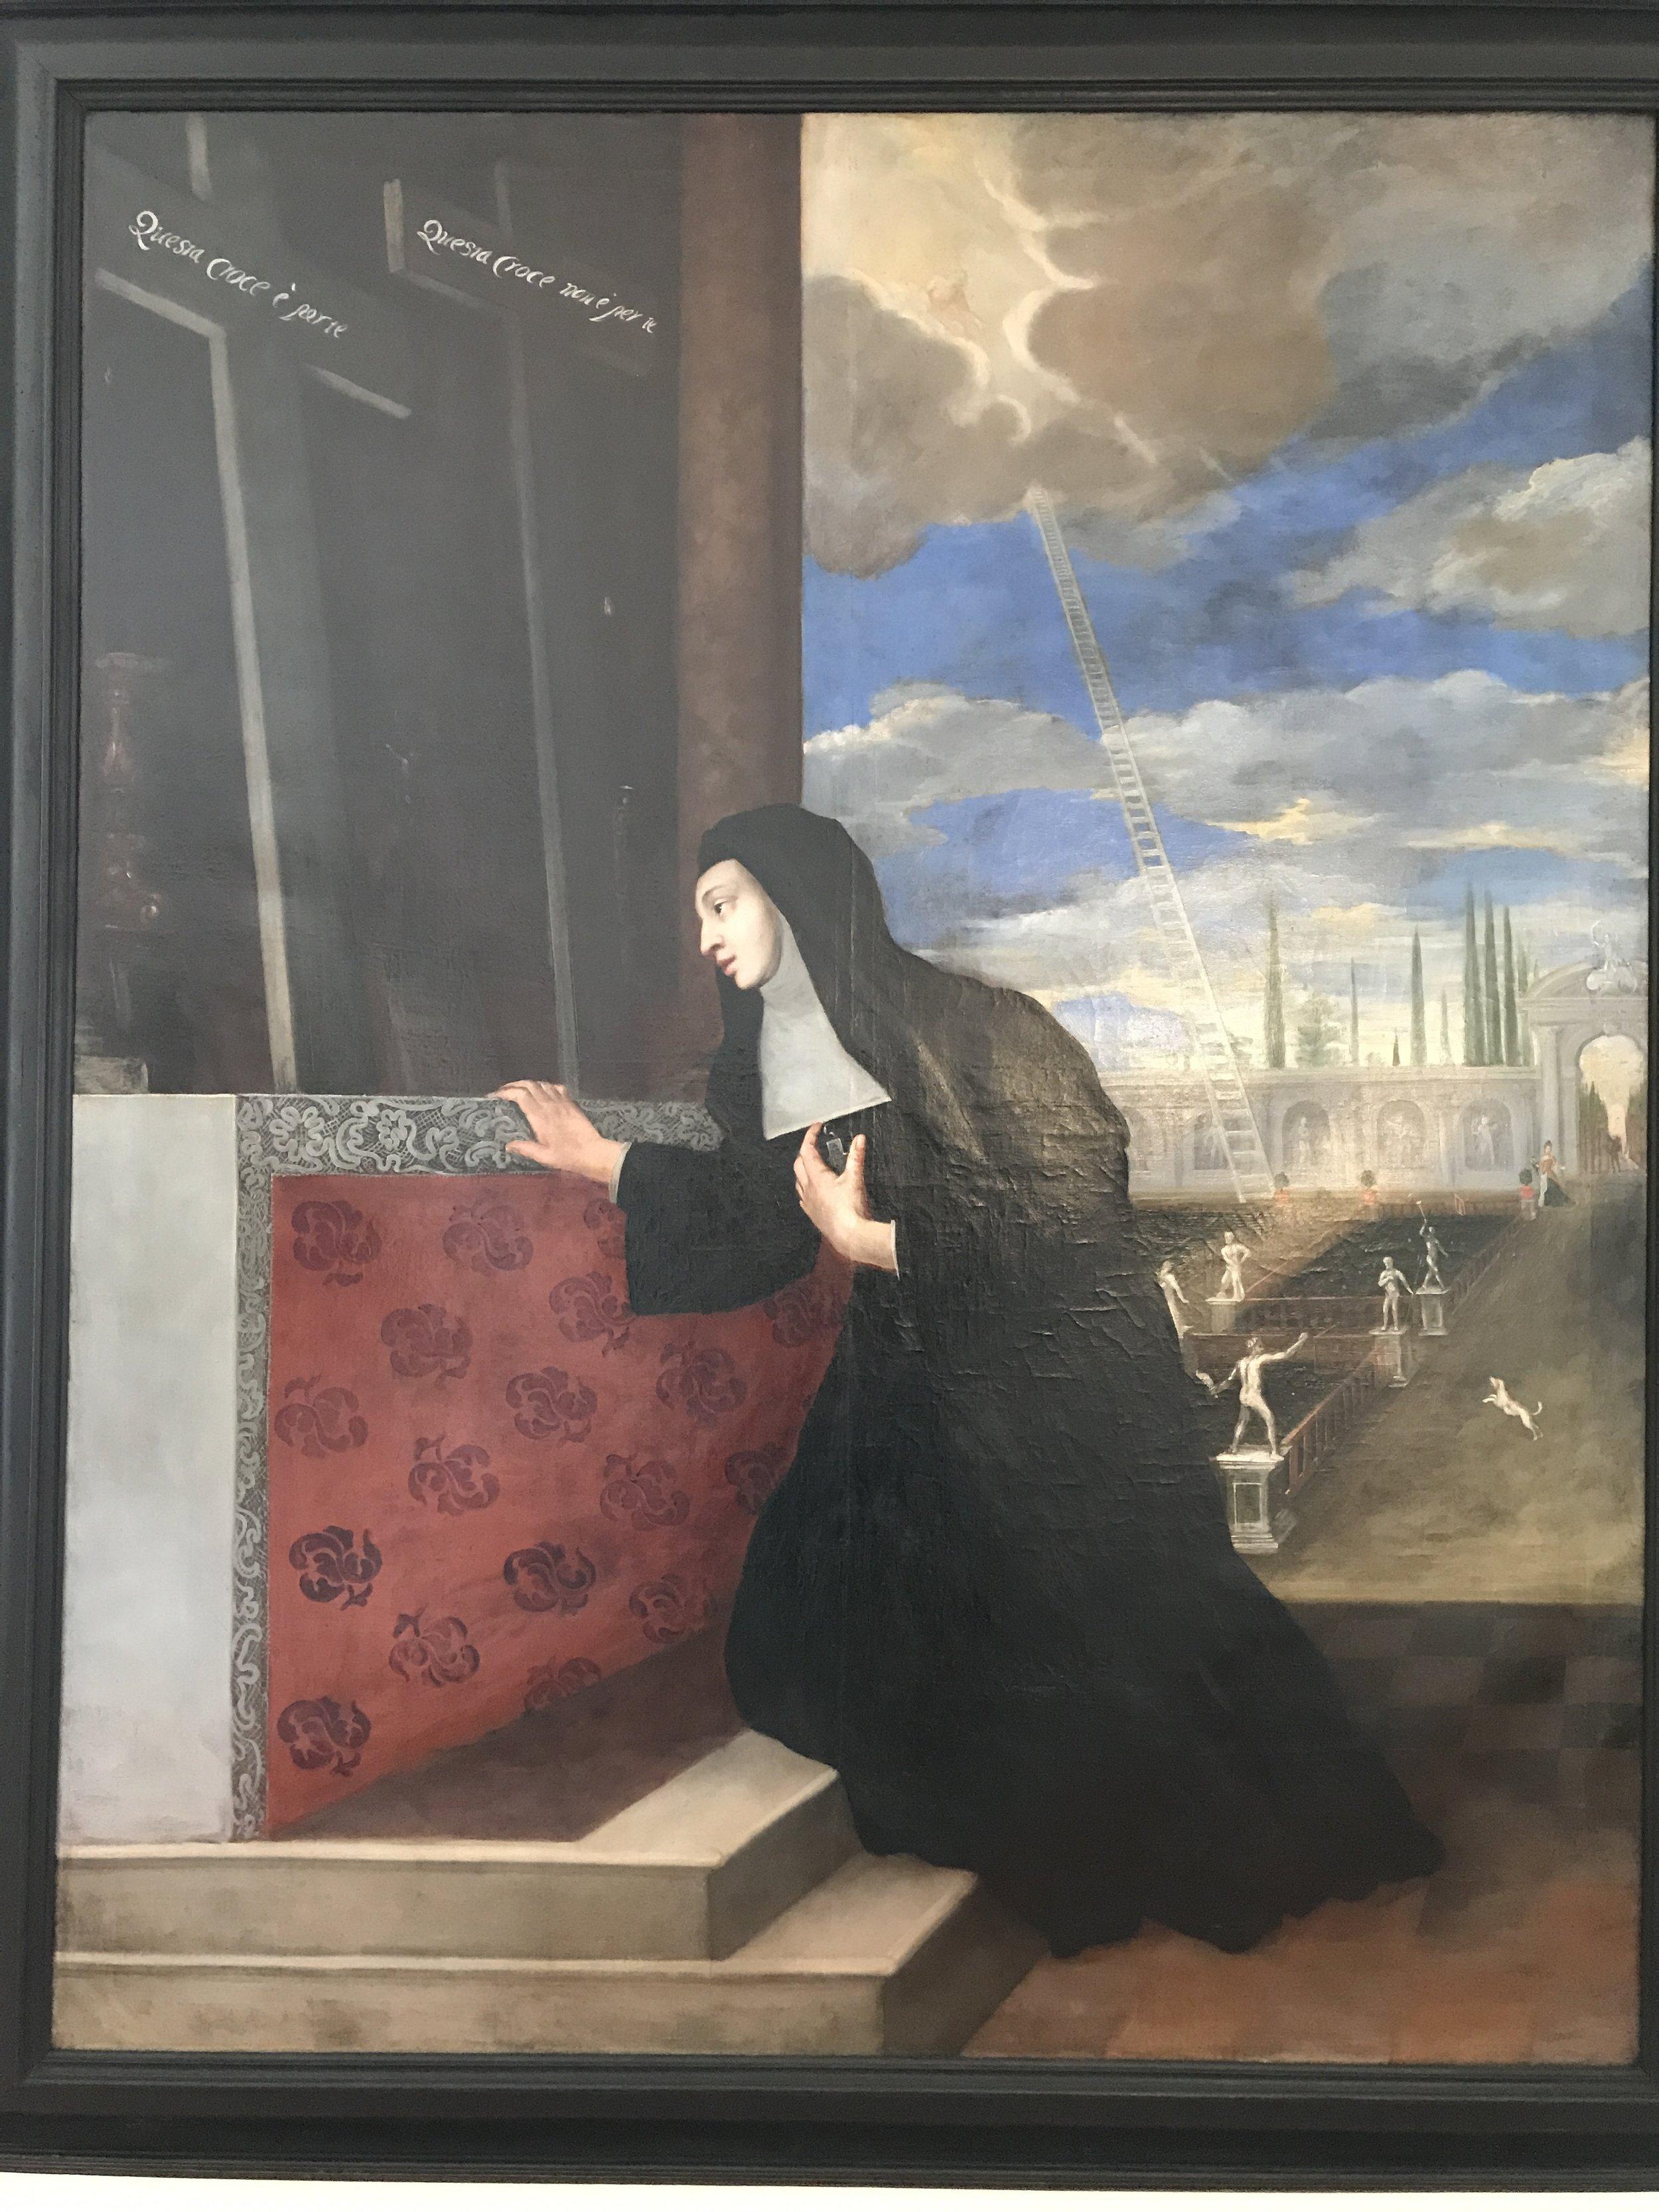 An image displaying key themes of Salesian faith